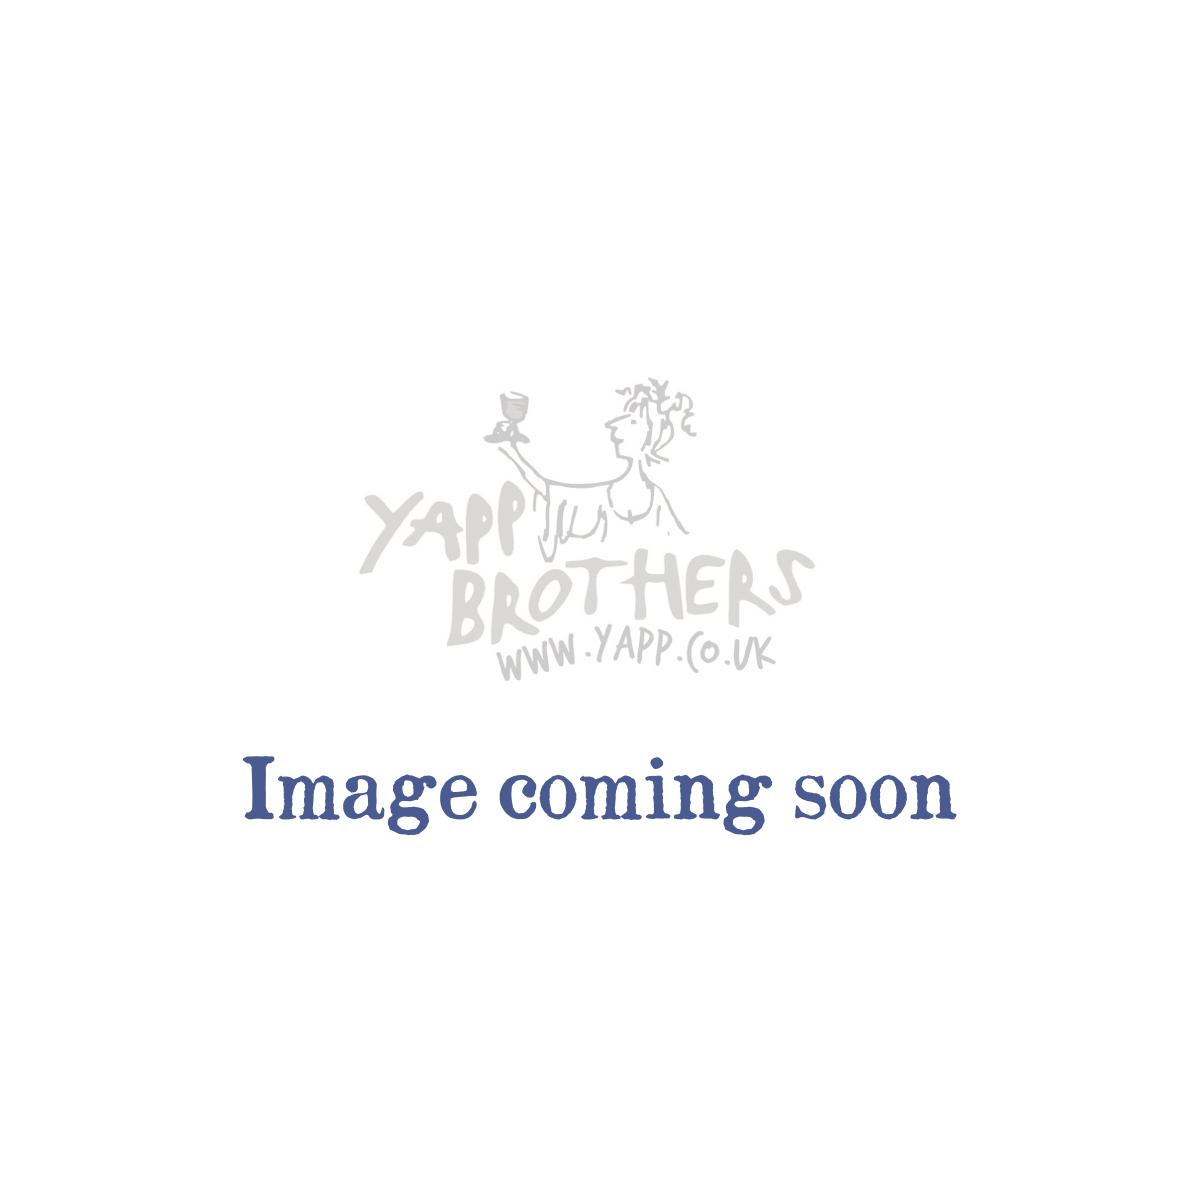 Forest Hill Vineyard: 'Estate' Chardonnay 2019 - Bottle Rear Label